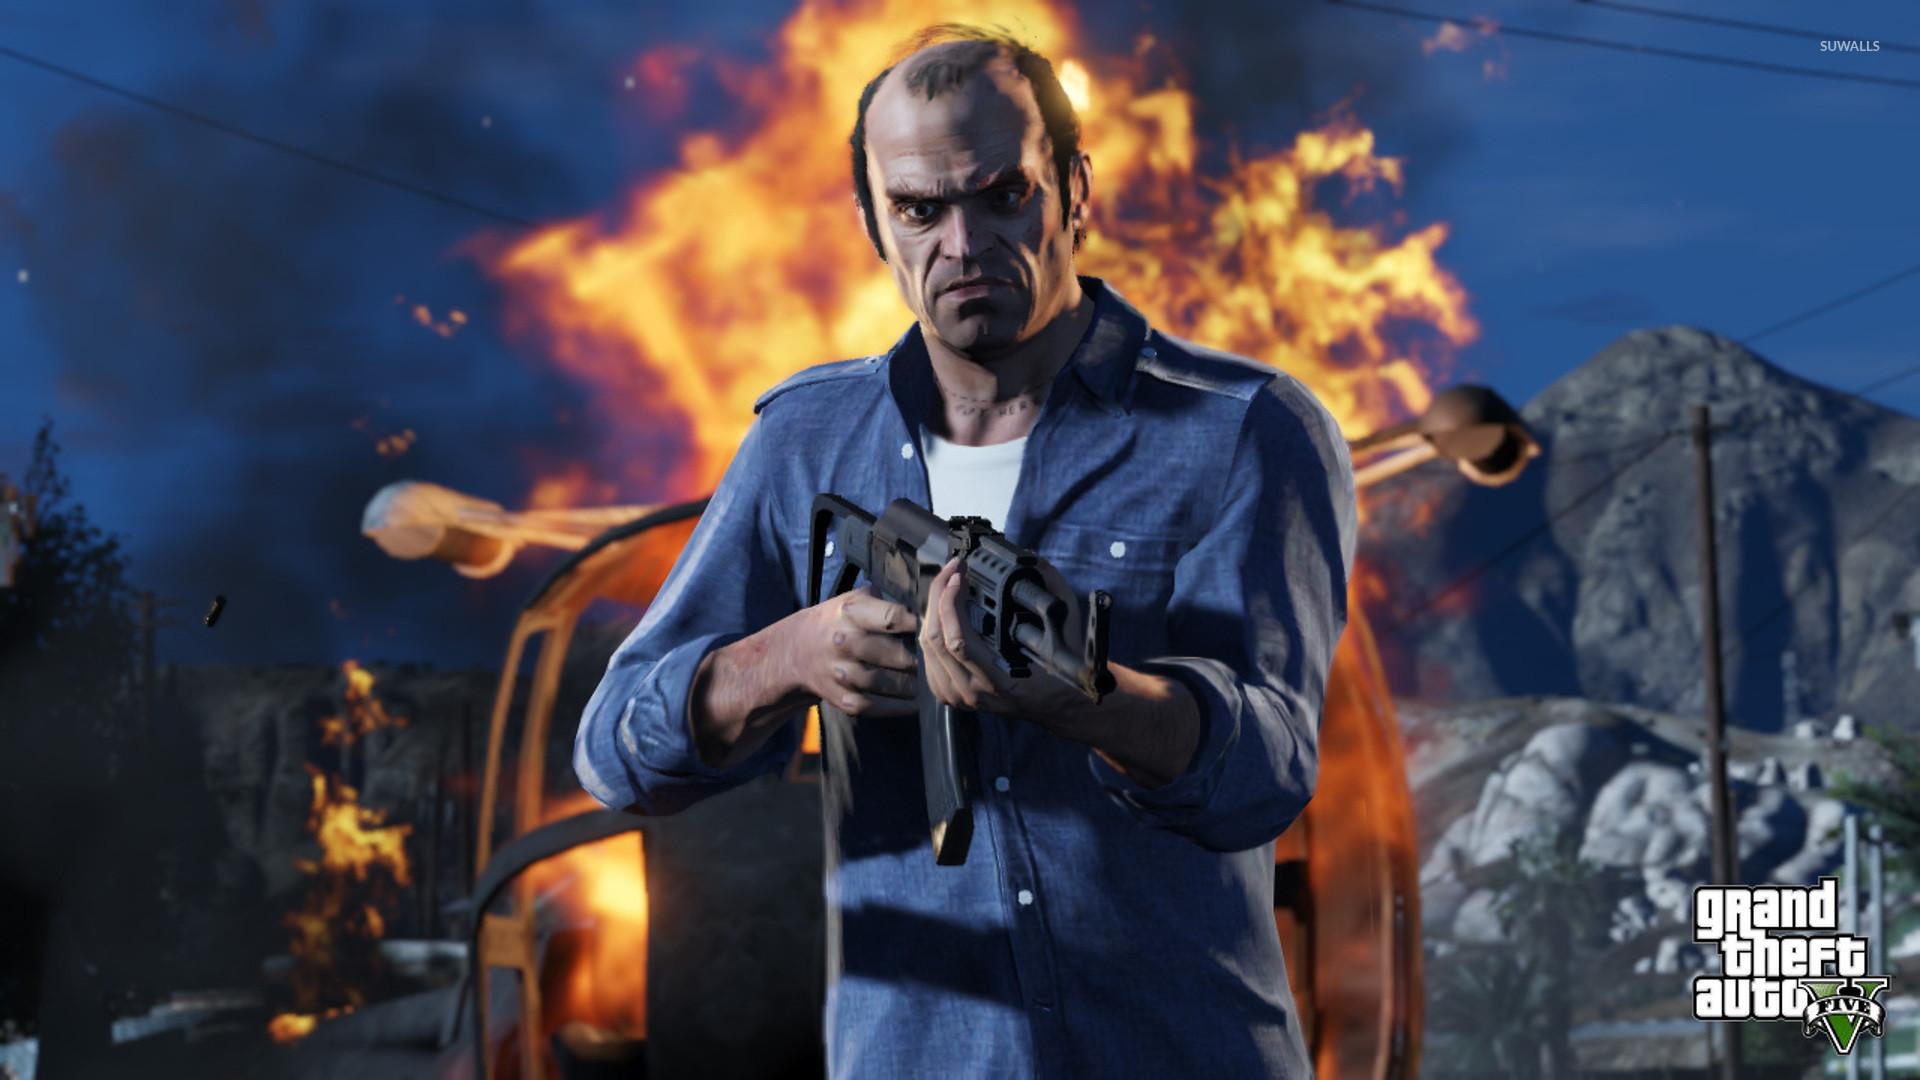 Trevor – Grand Theft Auto V [2] wallpaper jpg